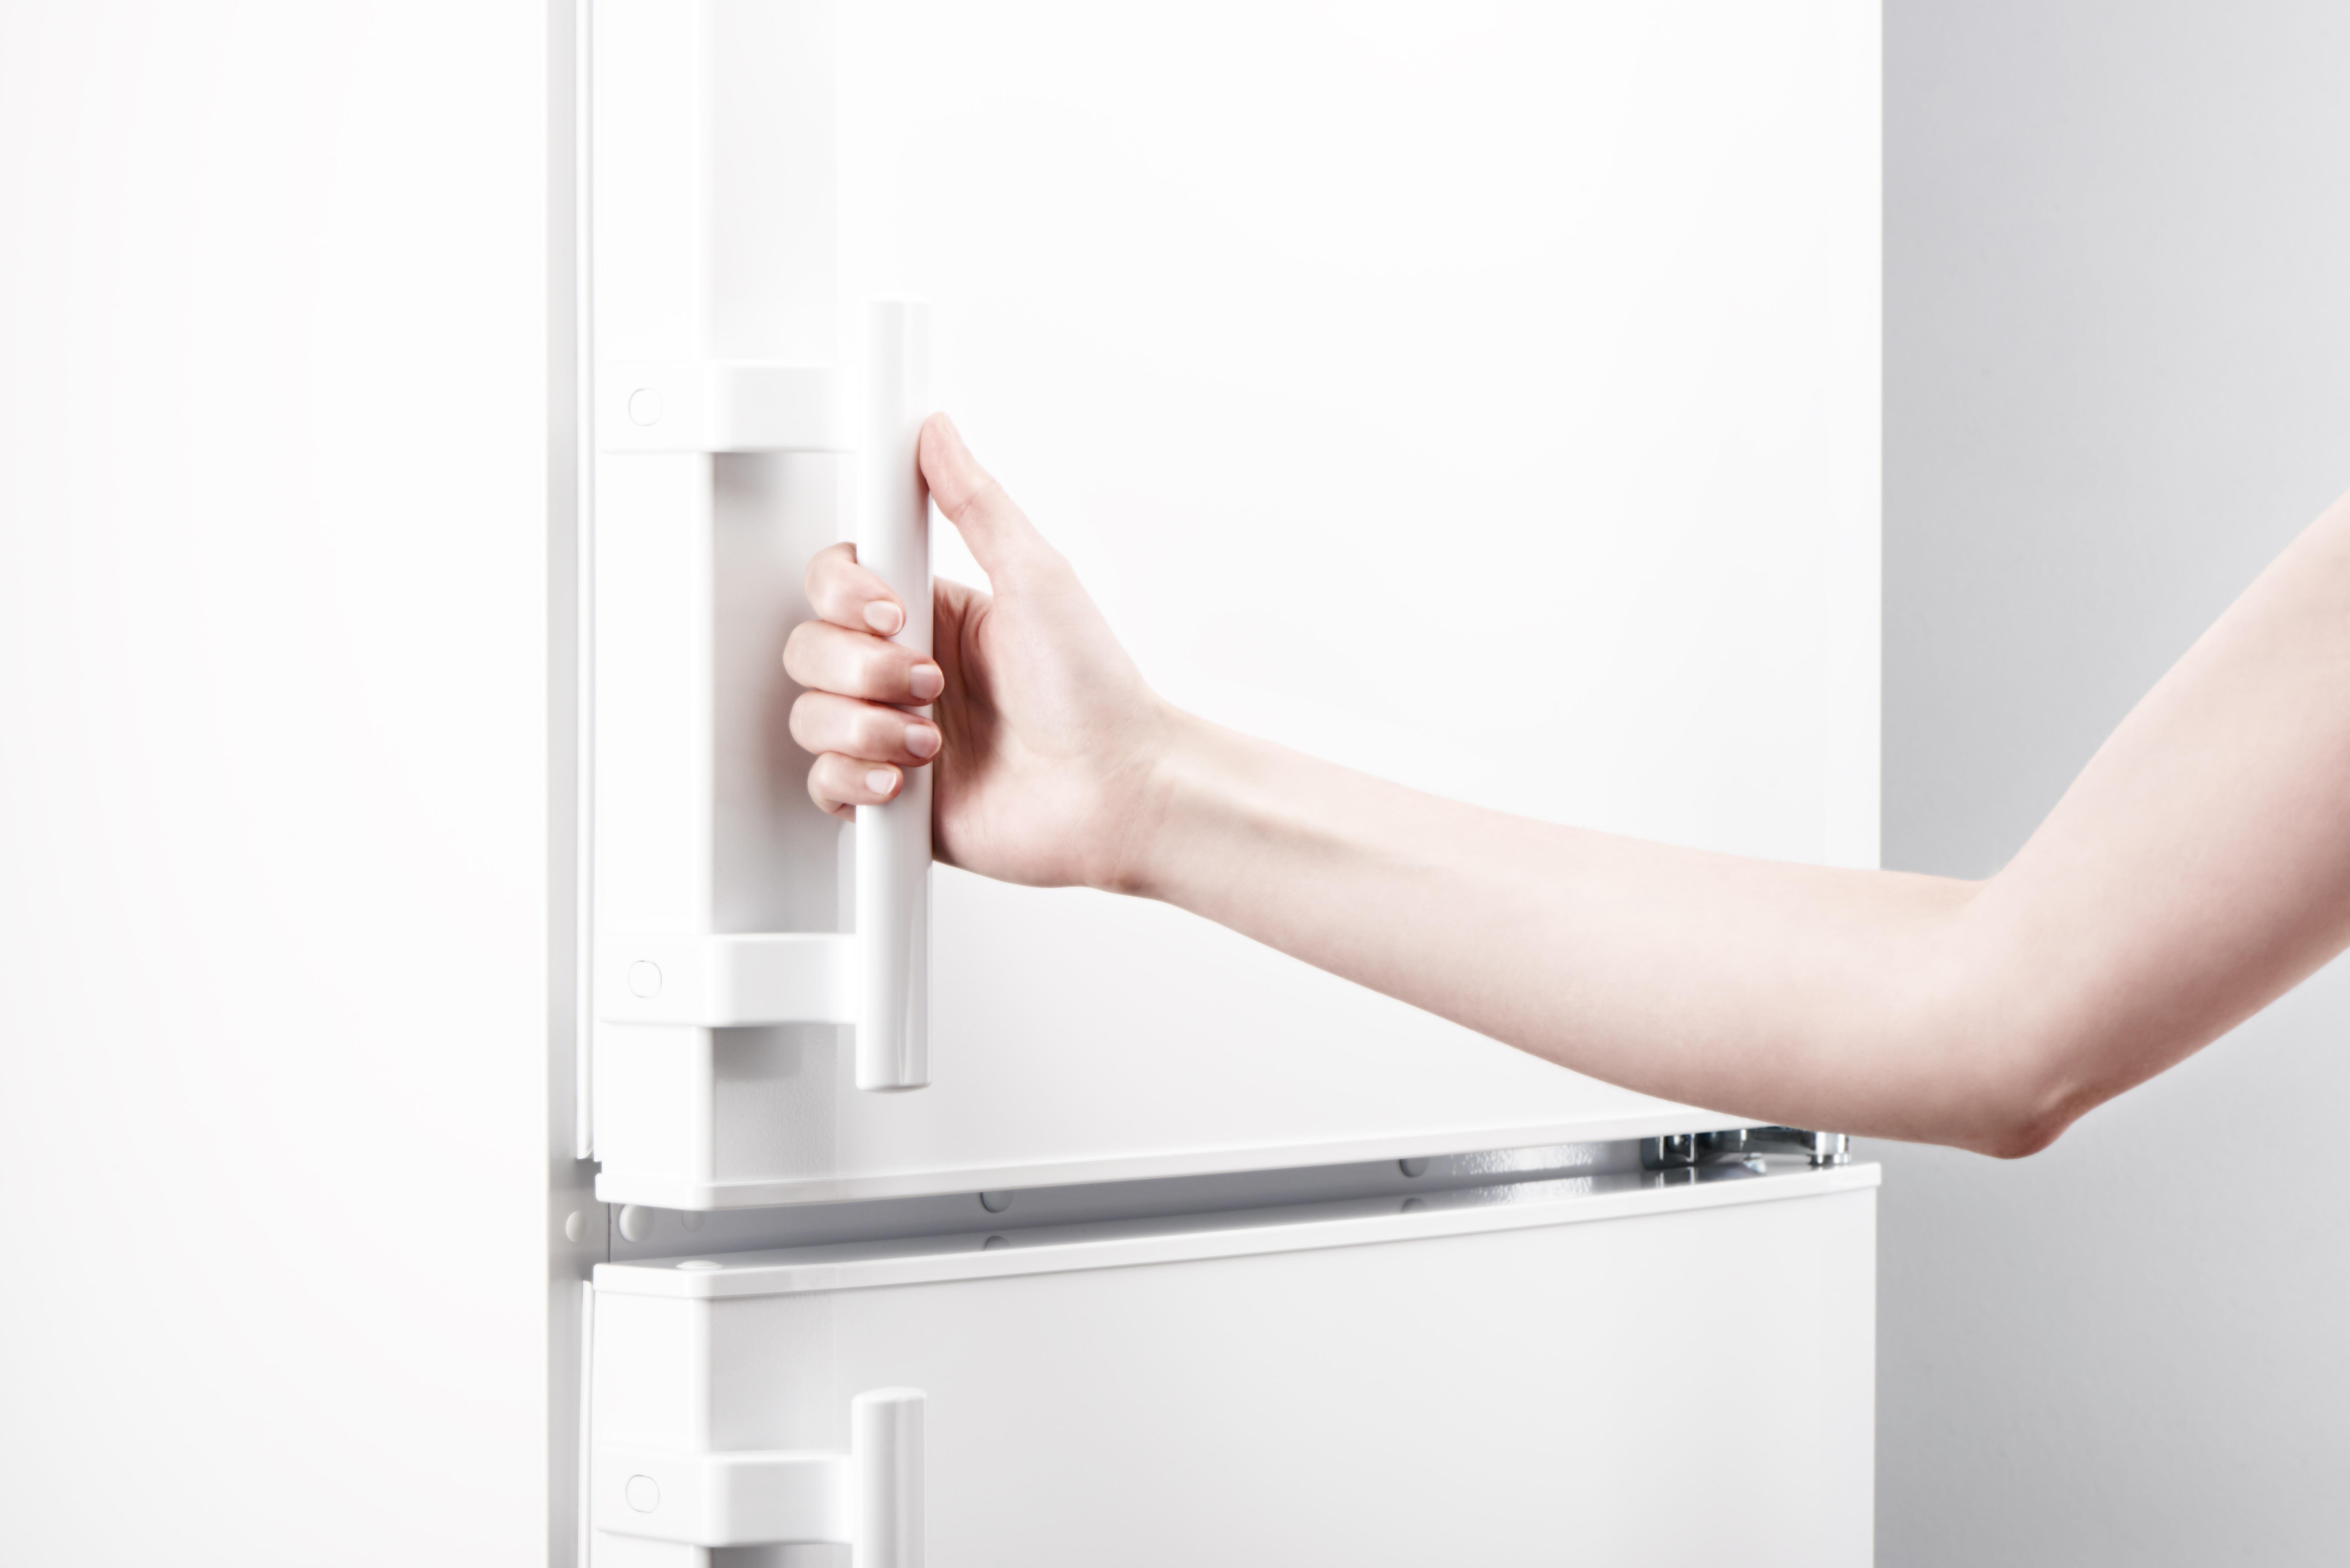 refrigerator power out.jpg